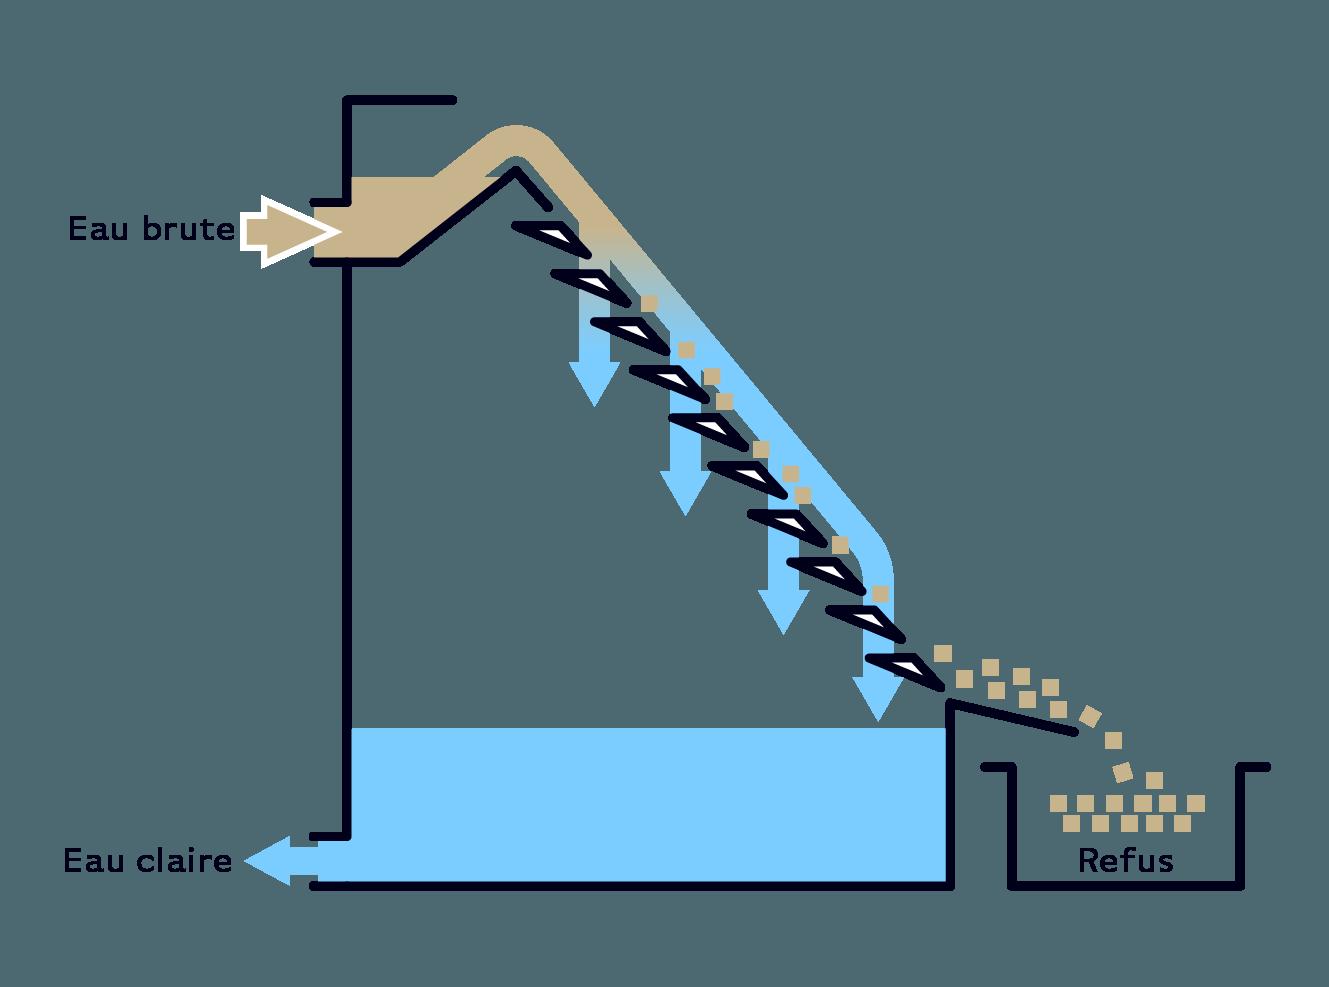 Serinol solutions et equipement de traitement des eaux schema principe equipement tamis statique SERTIS